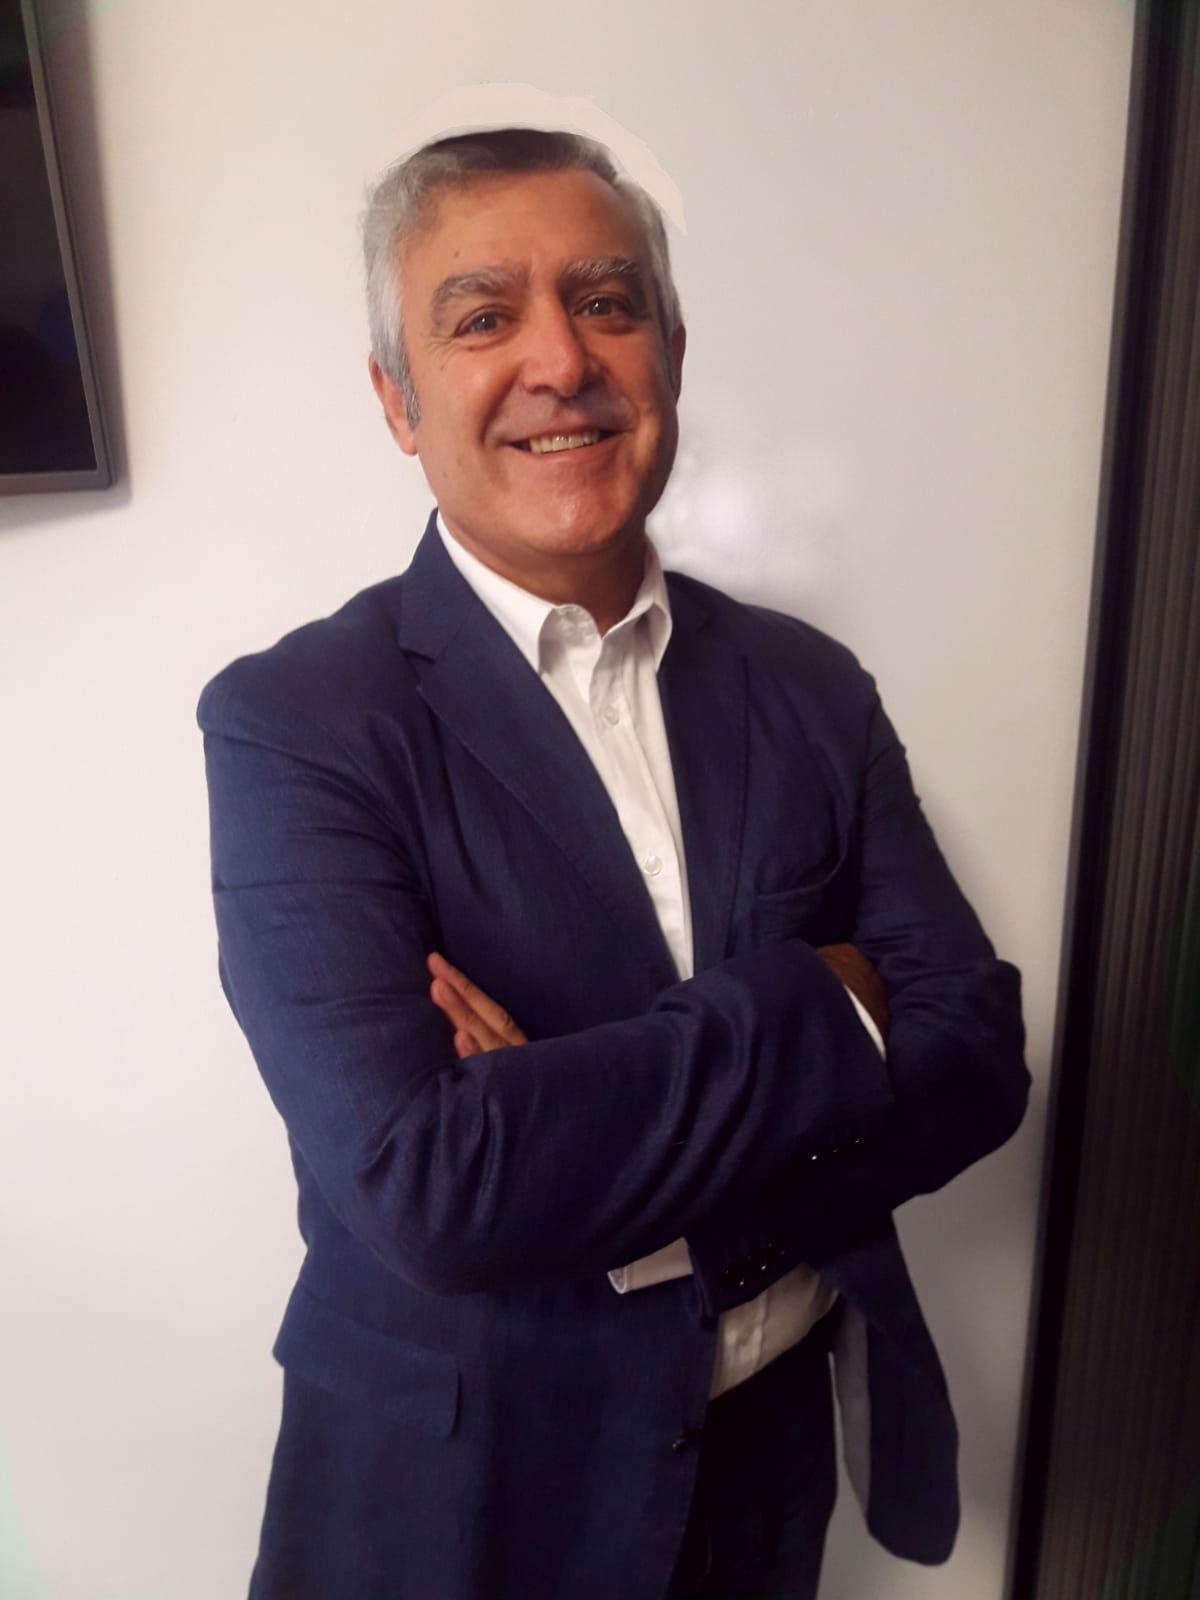 Francisco José Cerdeira